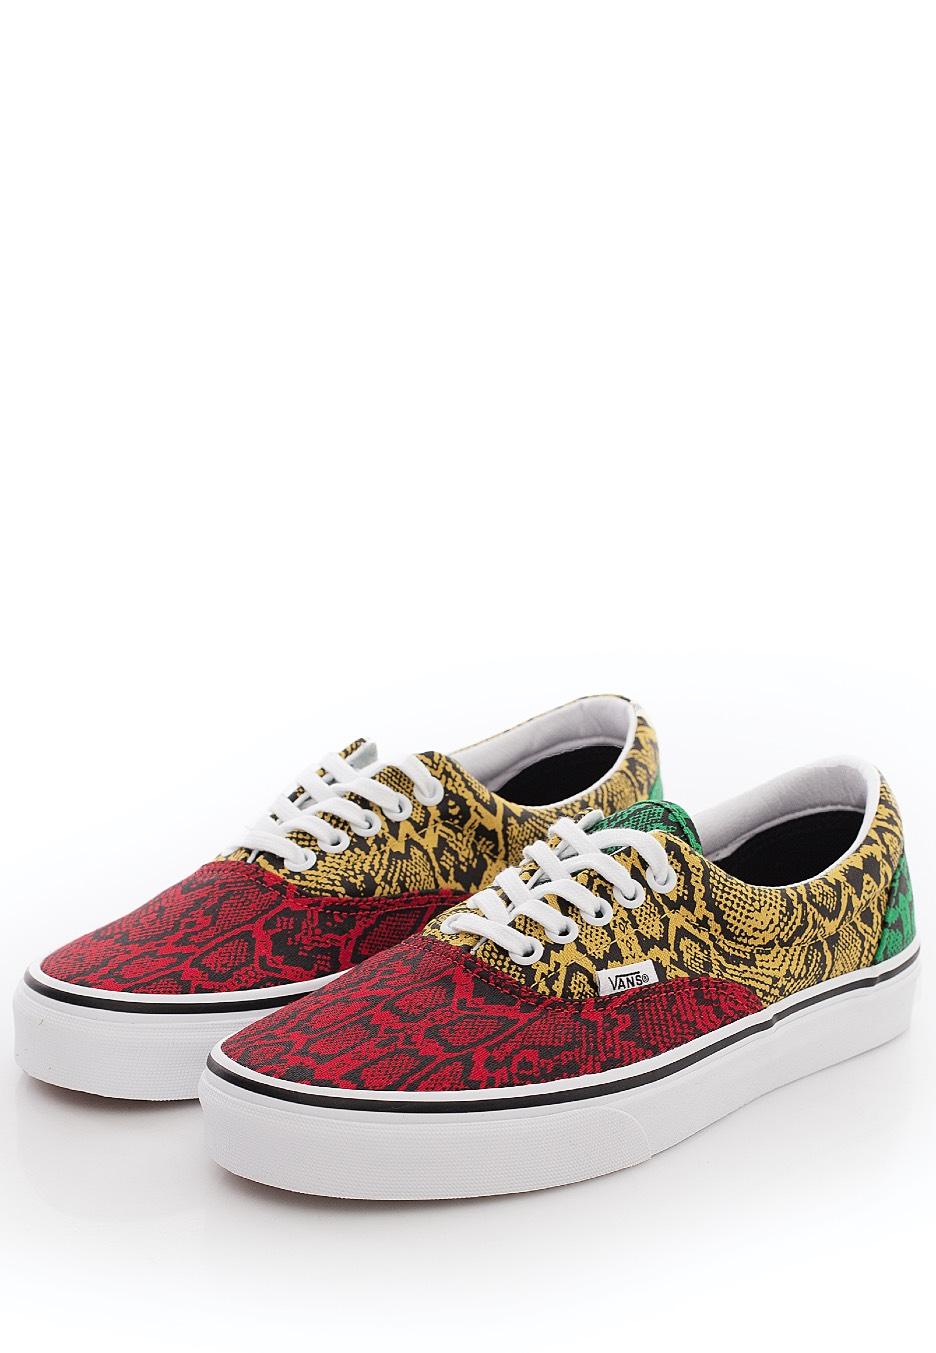 Vans - Era (Multi Python) Rasta/True White - Chaussures pour fille ...